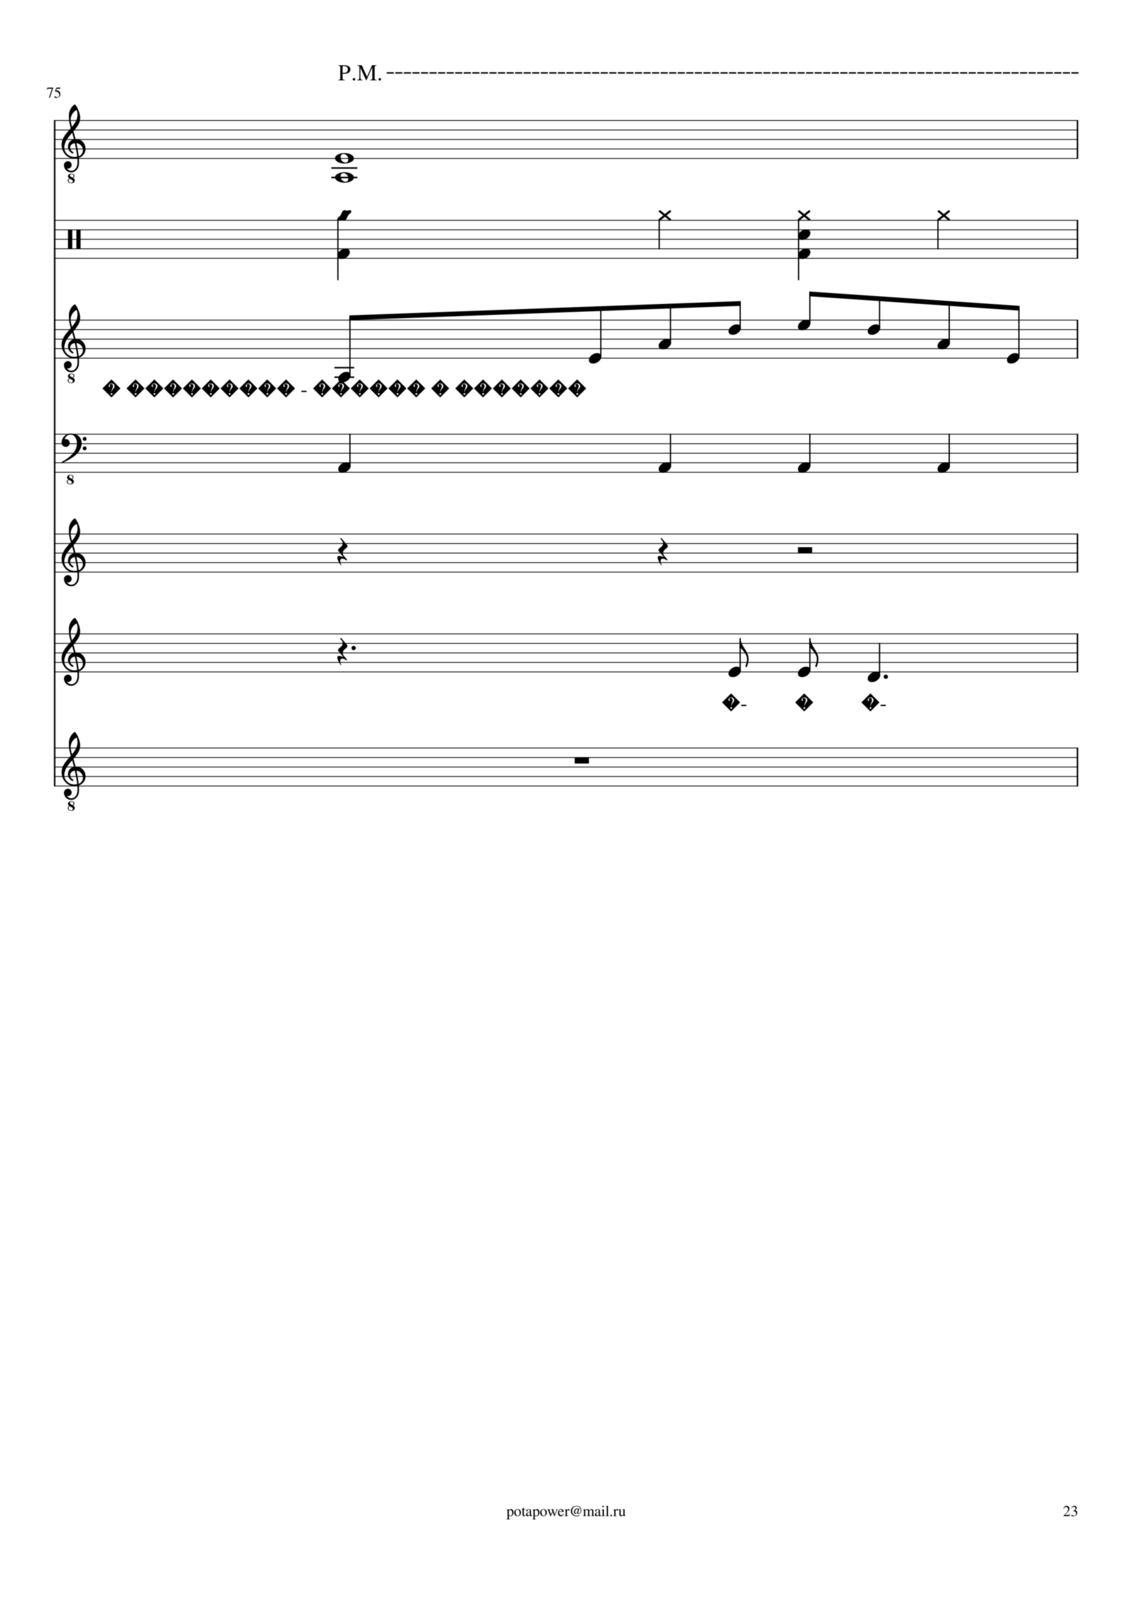 Ten lyubvi slide, Image 23